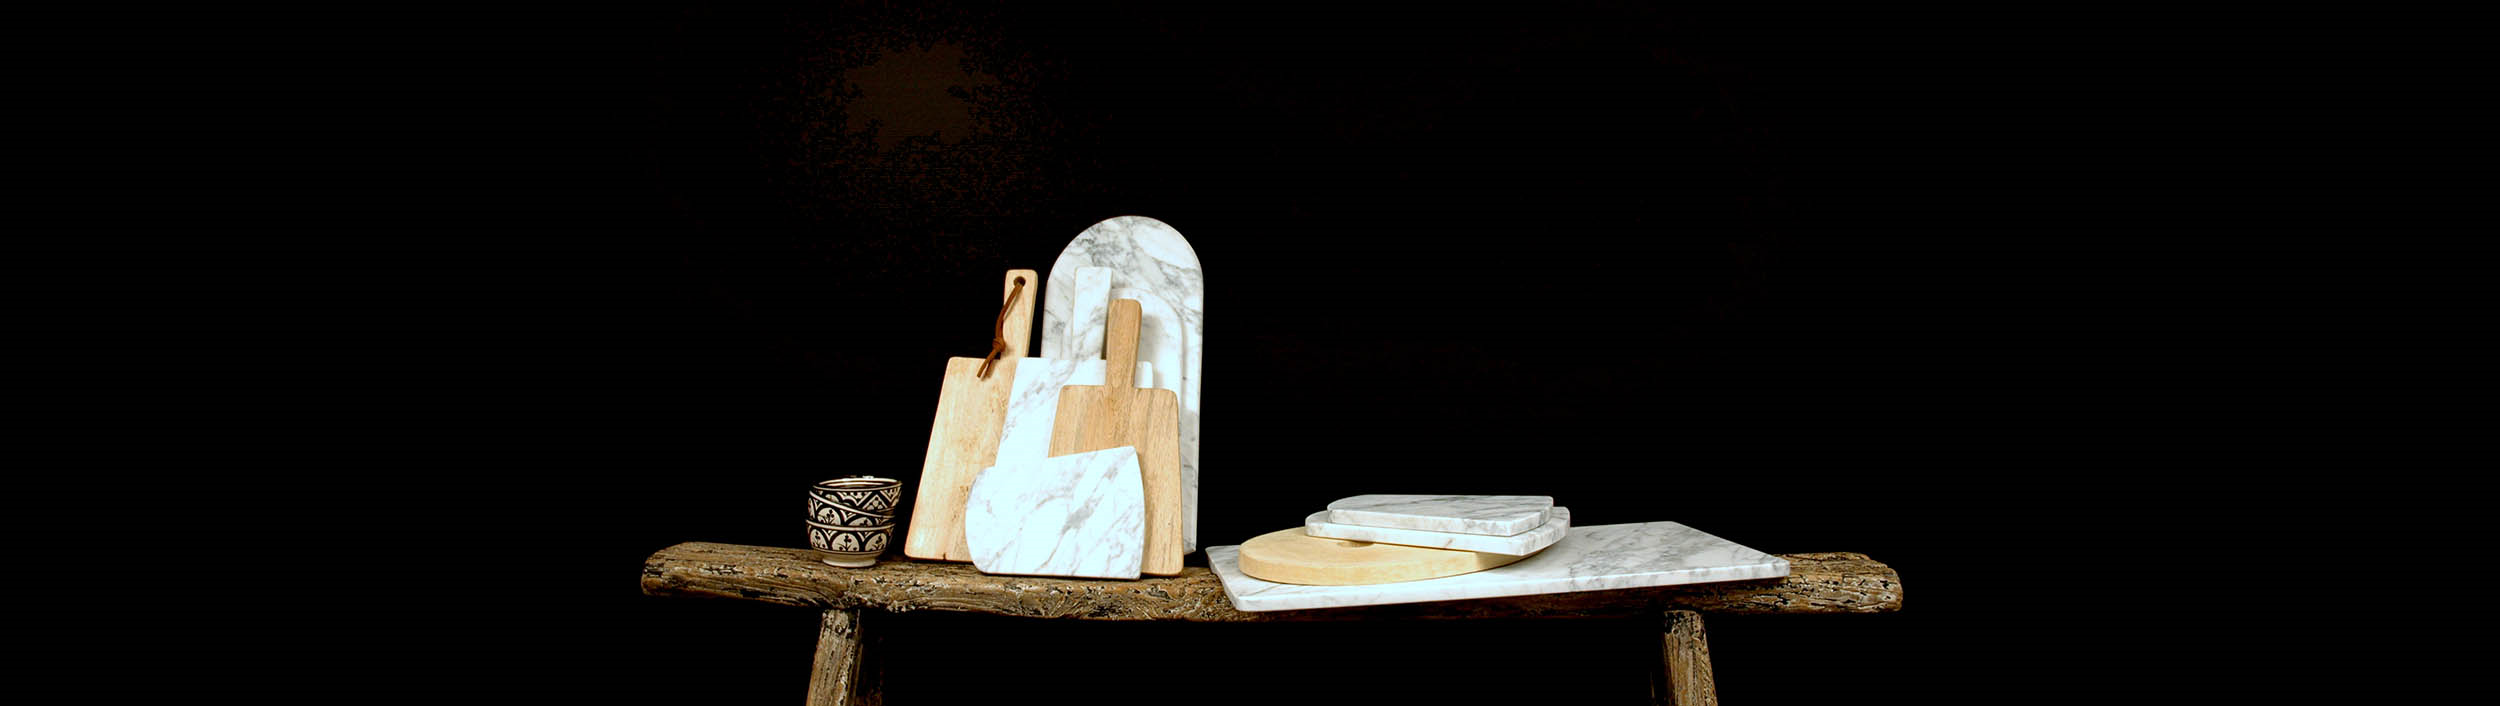 Nouvelle collection | A table |